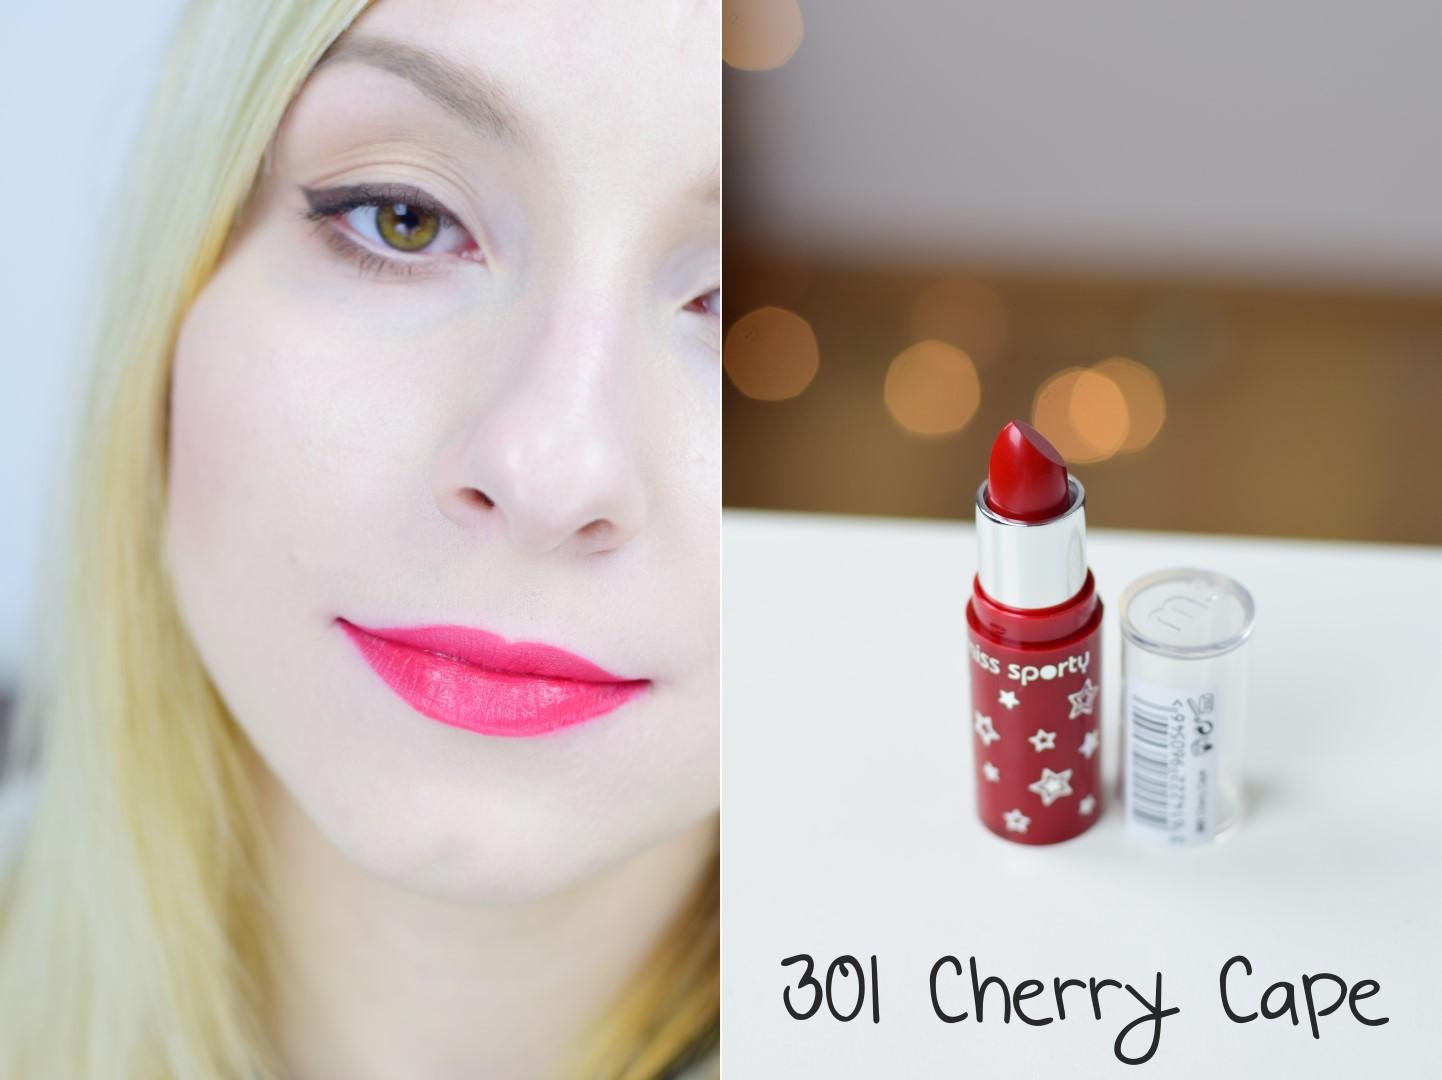 miss_sporty_wonder_smooth_blog_opinia_recenzja_swatche_cherry_cape_301